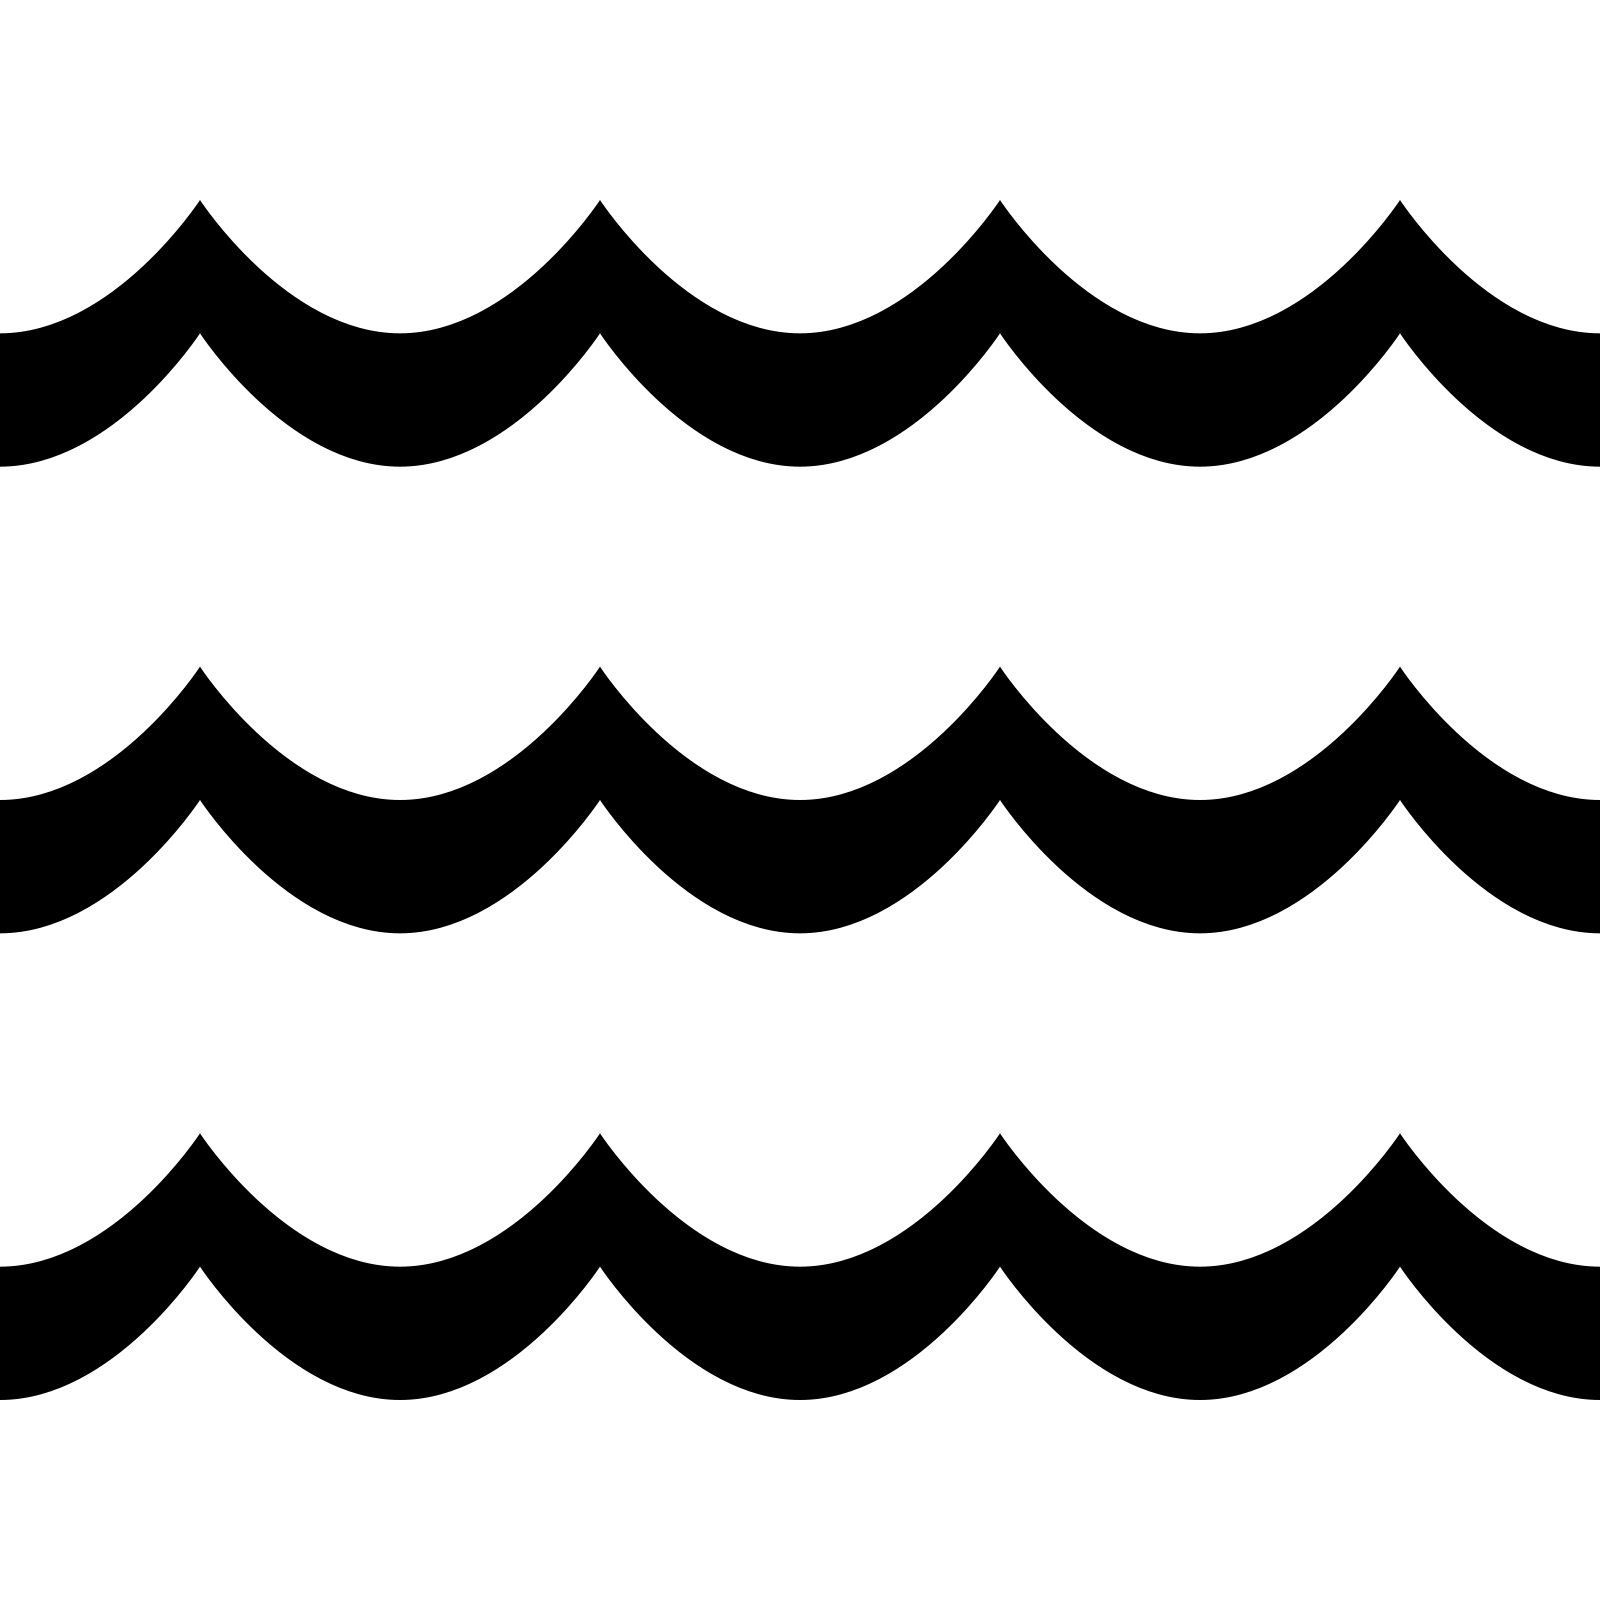 Onde PNG-PlusPNG.com-1600 - Onde PNG